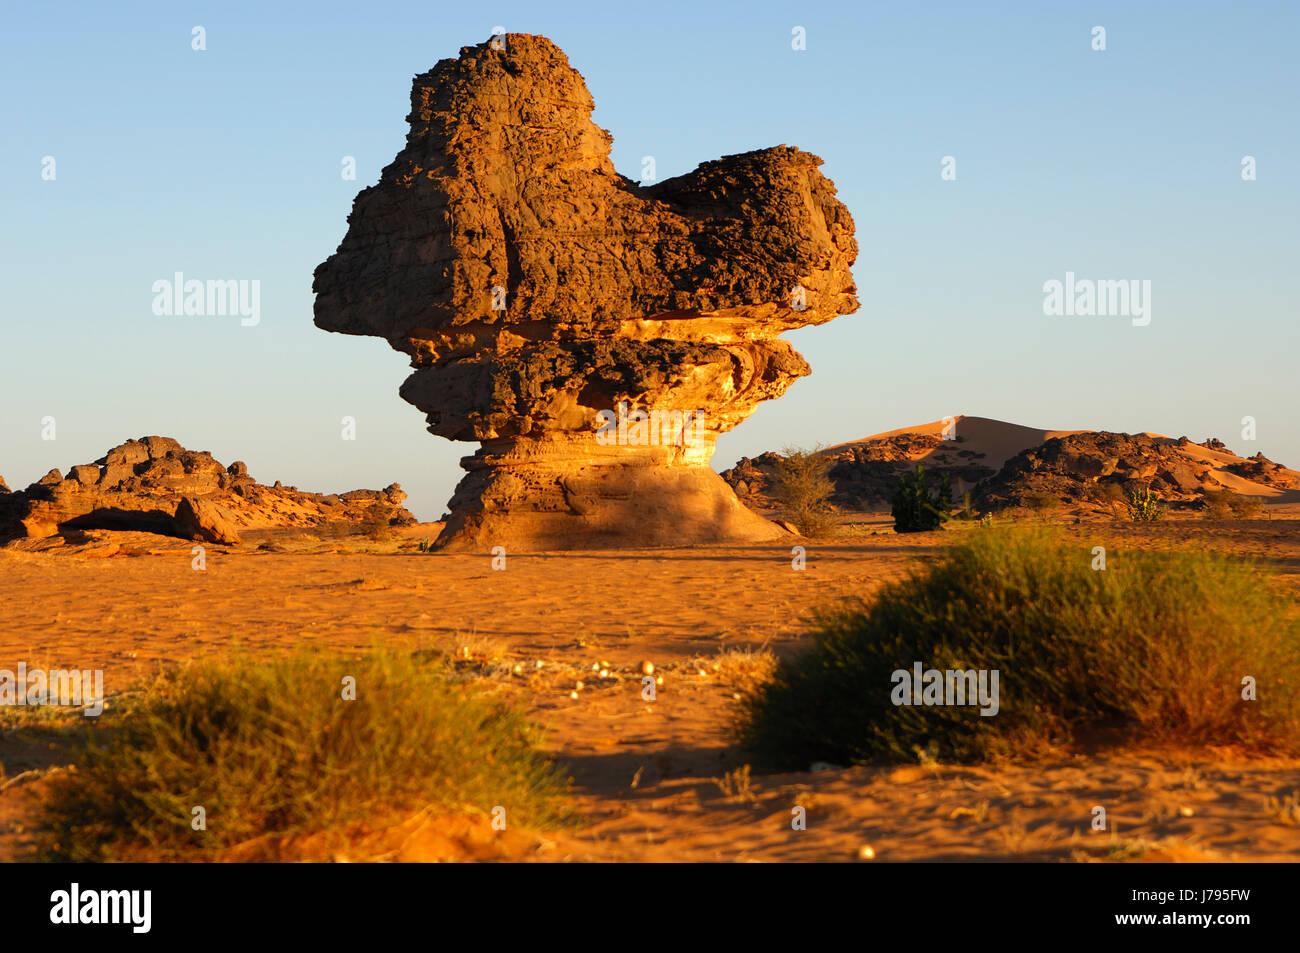 rock mushroom in acacus mountains,libya - Stock Image